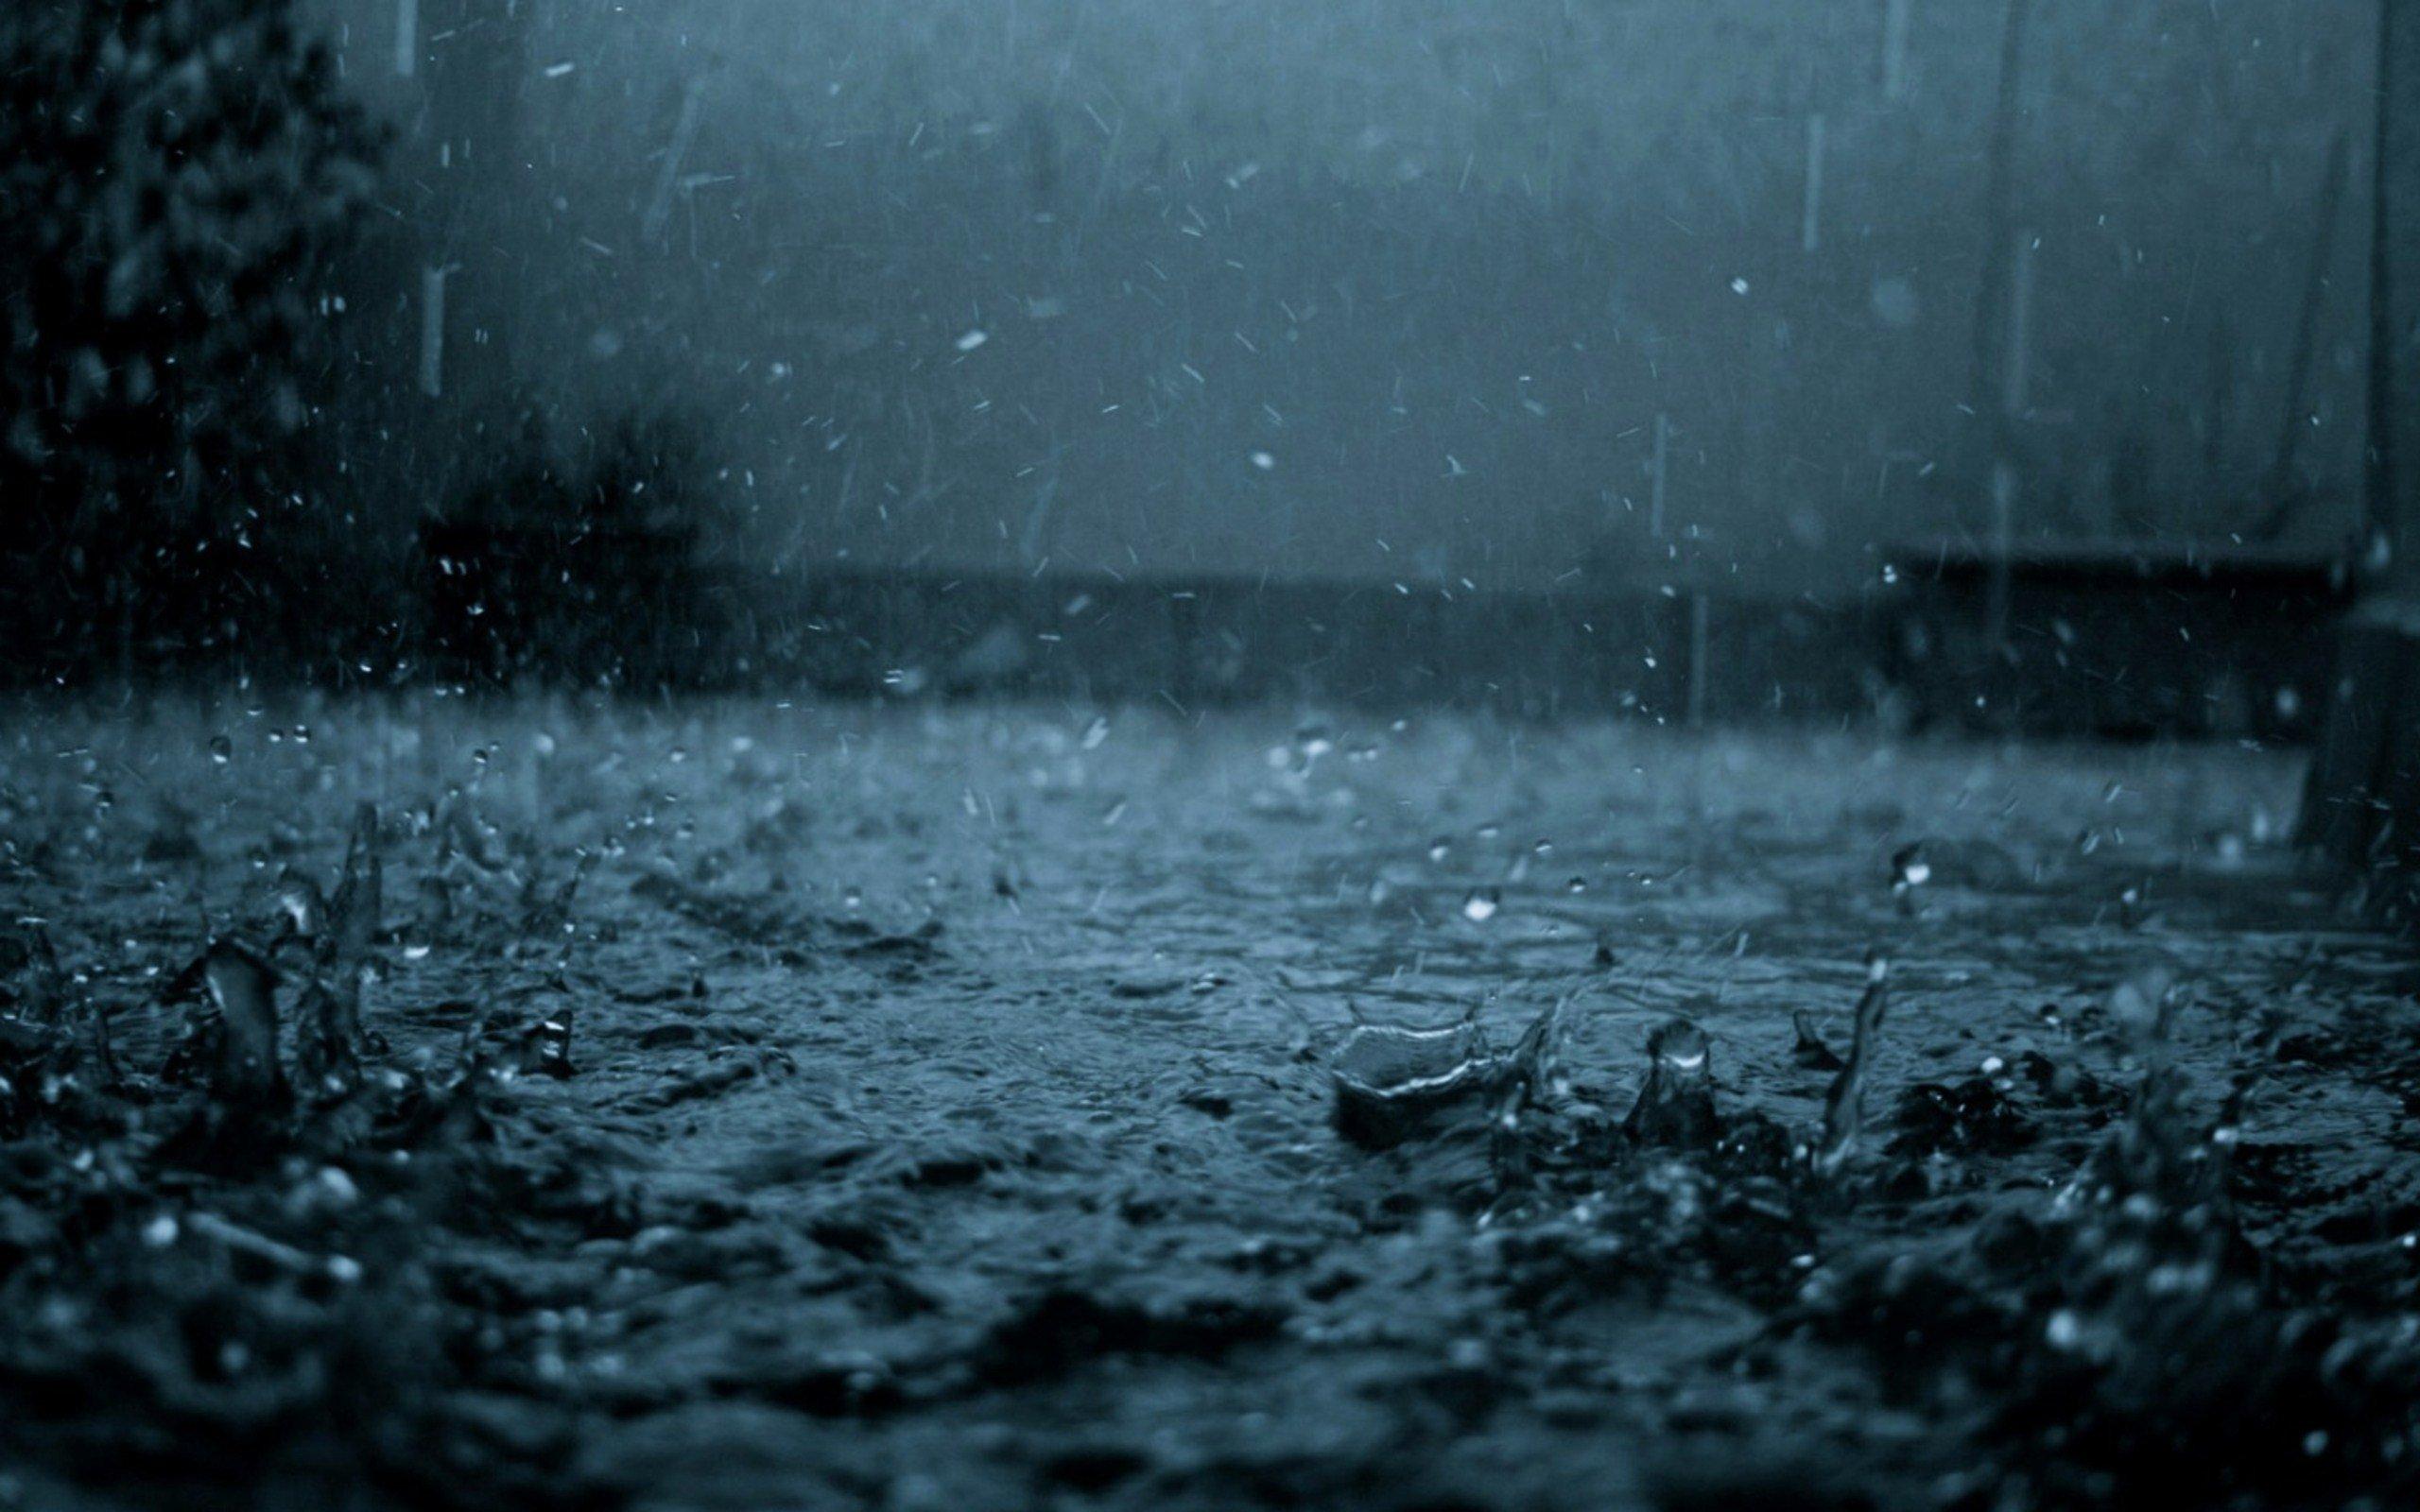 Rain Hd Wallpaper Background Image 2560x1600 Id 201751